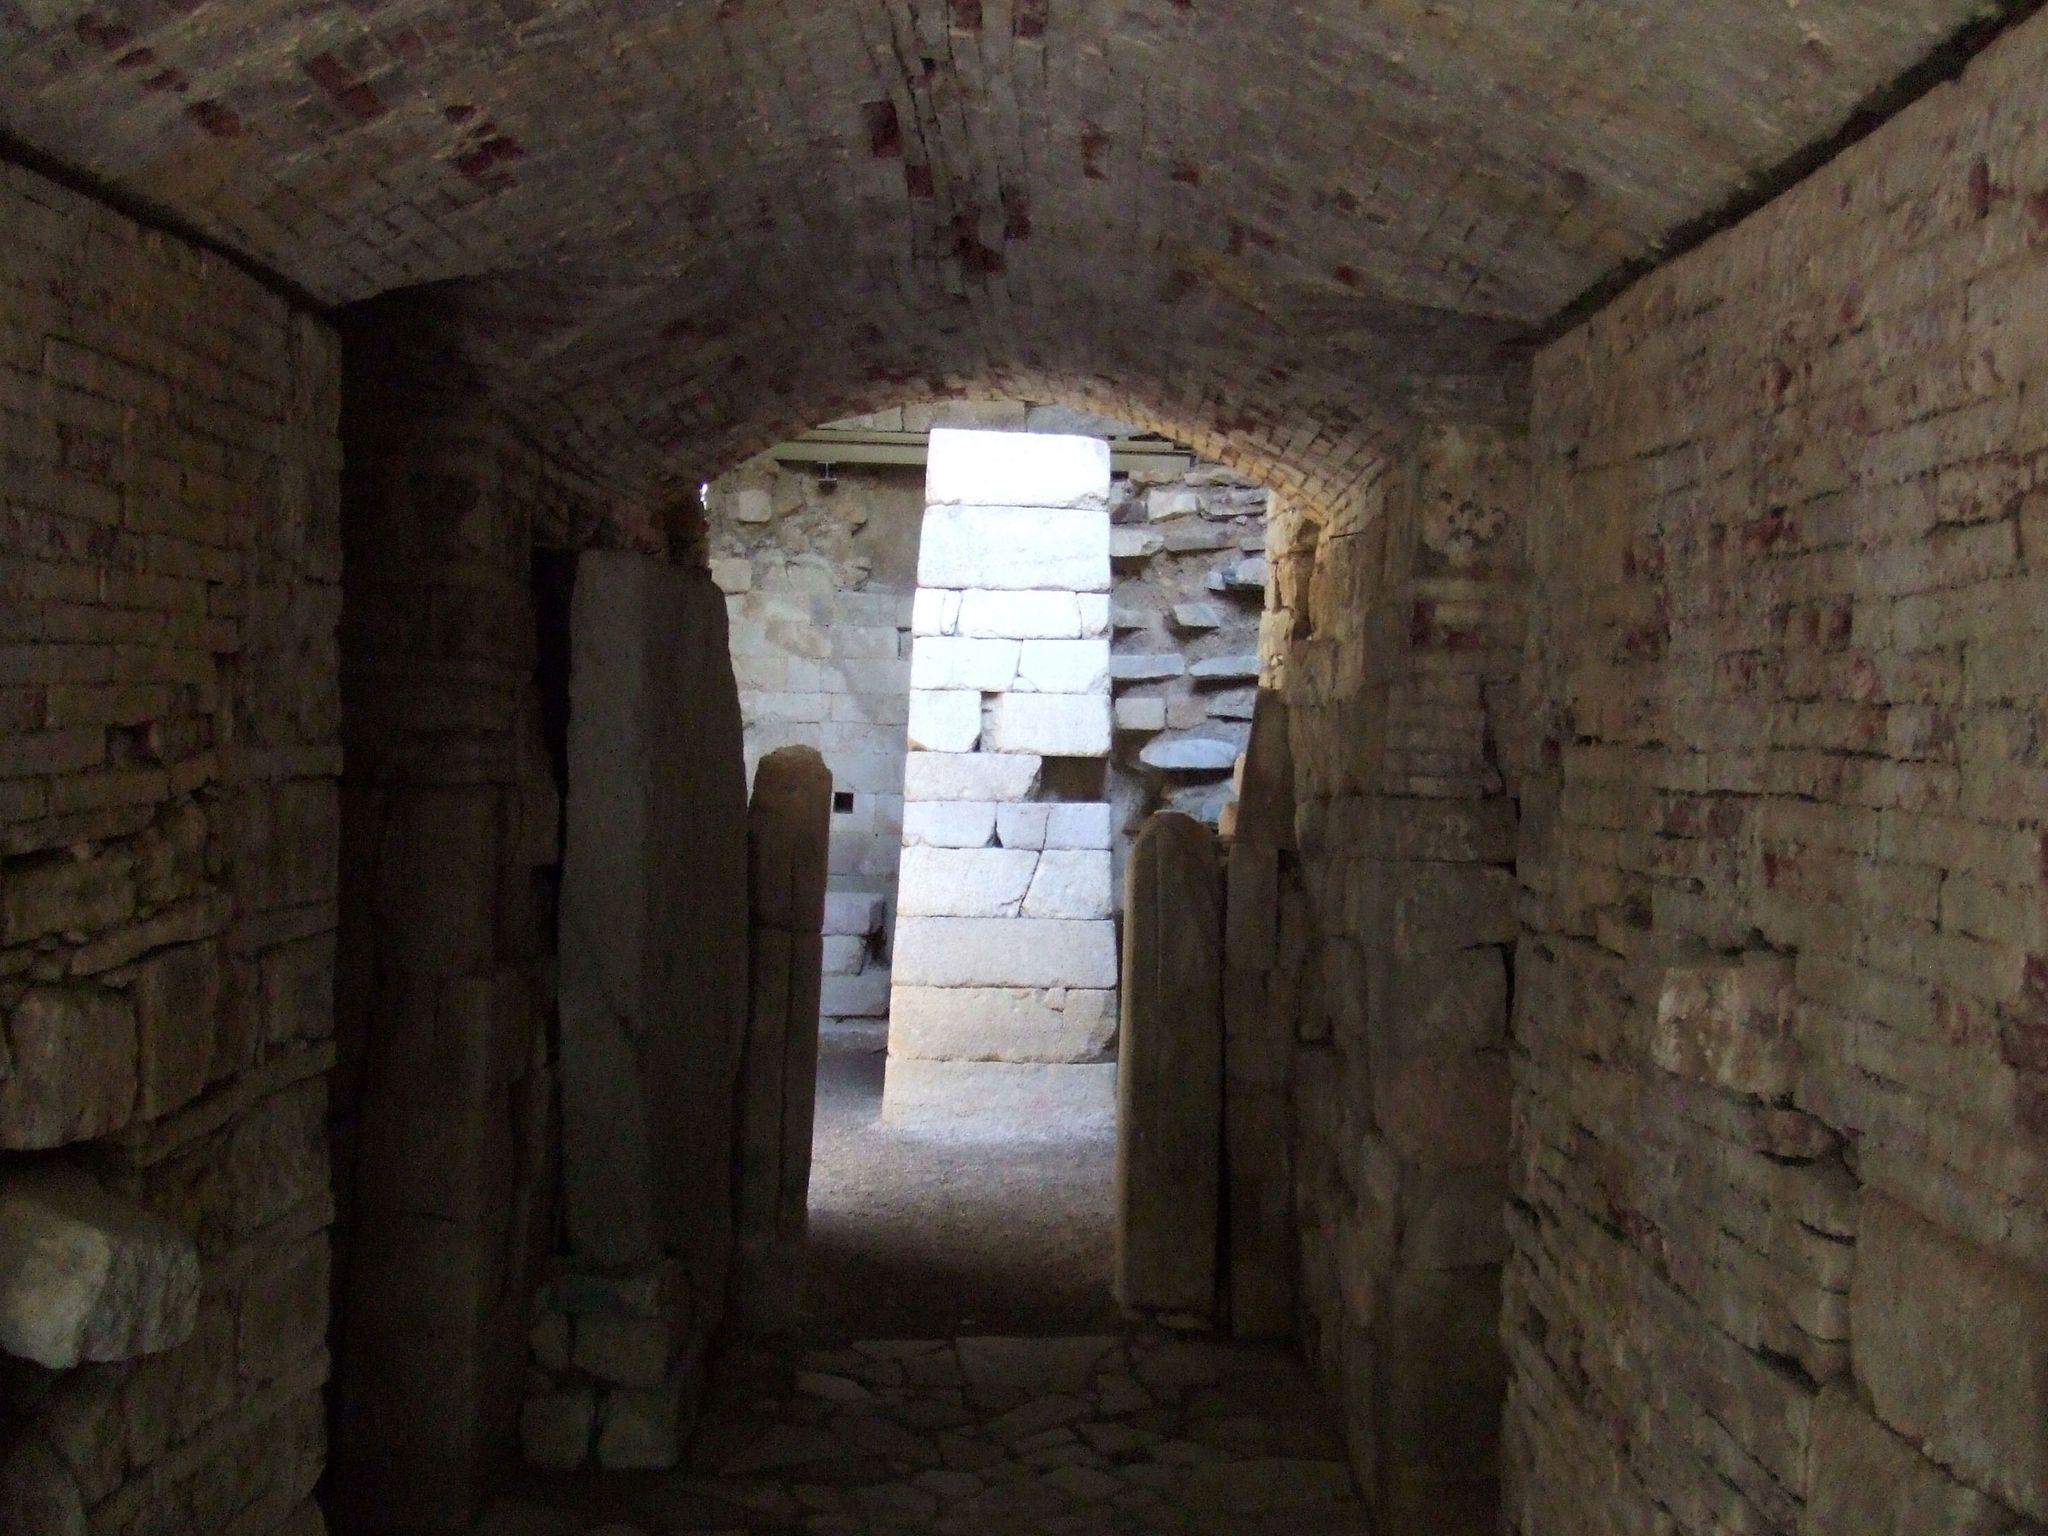 Pietrera Vestibule, Entrance to the Pietrera Tomb, Tholos tomb, Etruscan civilisation, 7th century BCE.